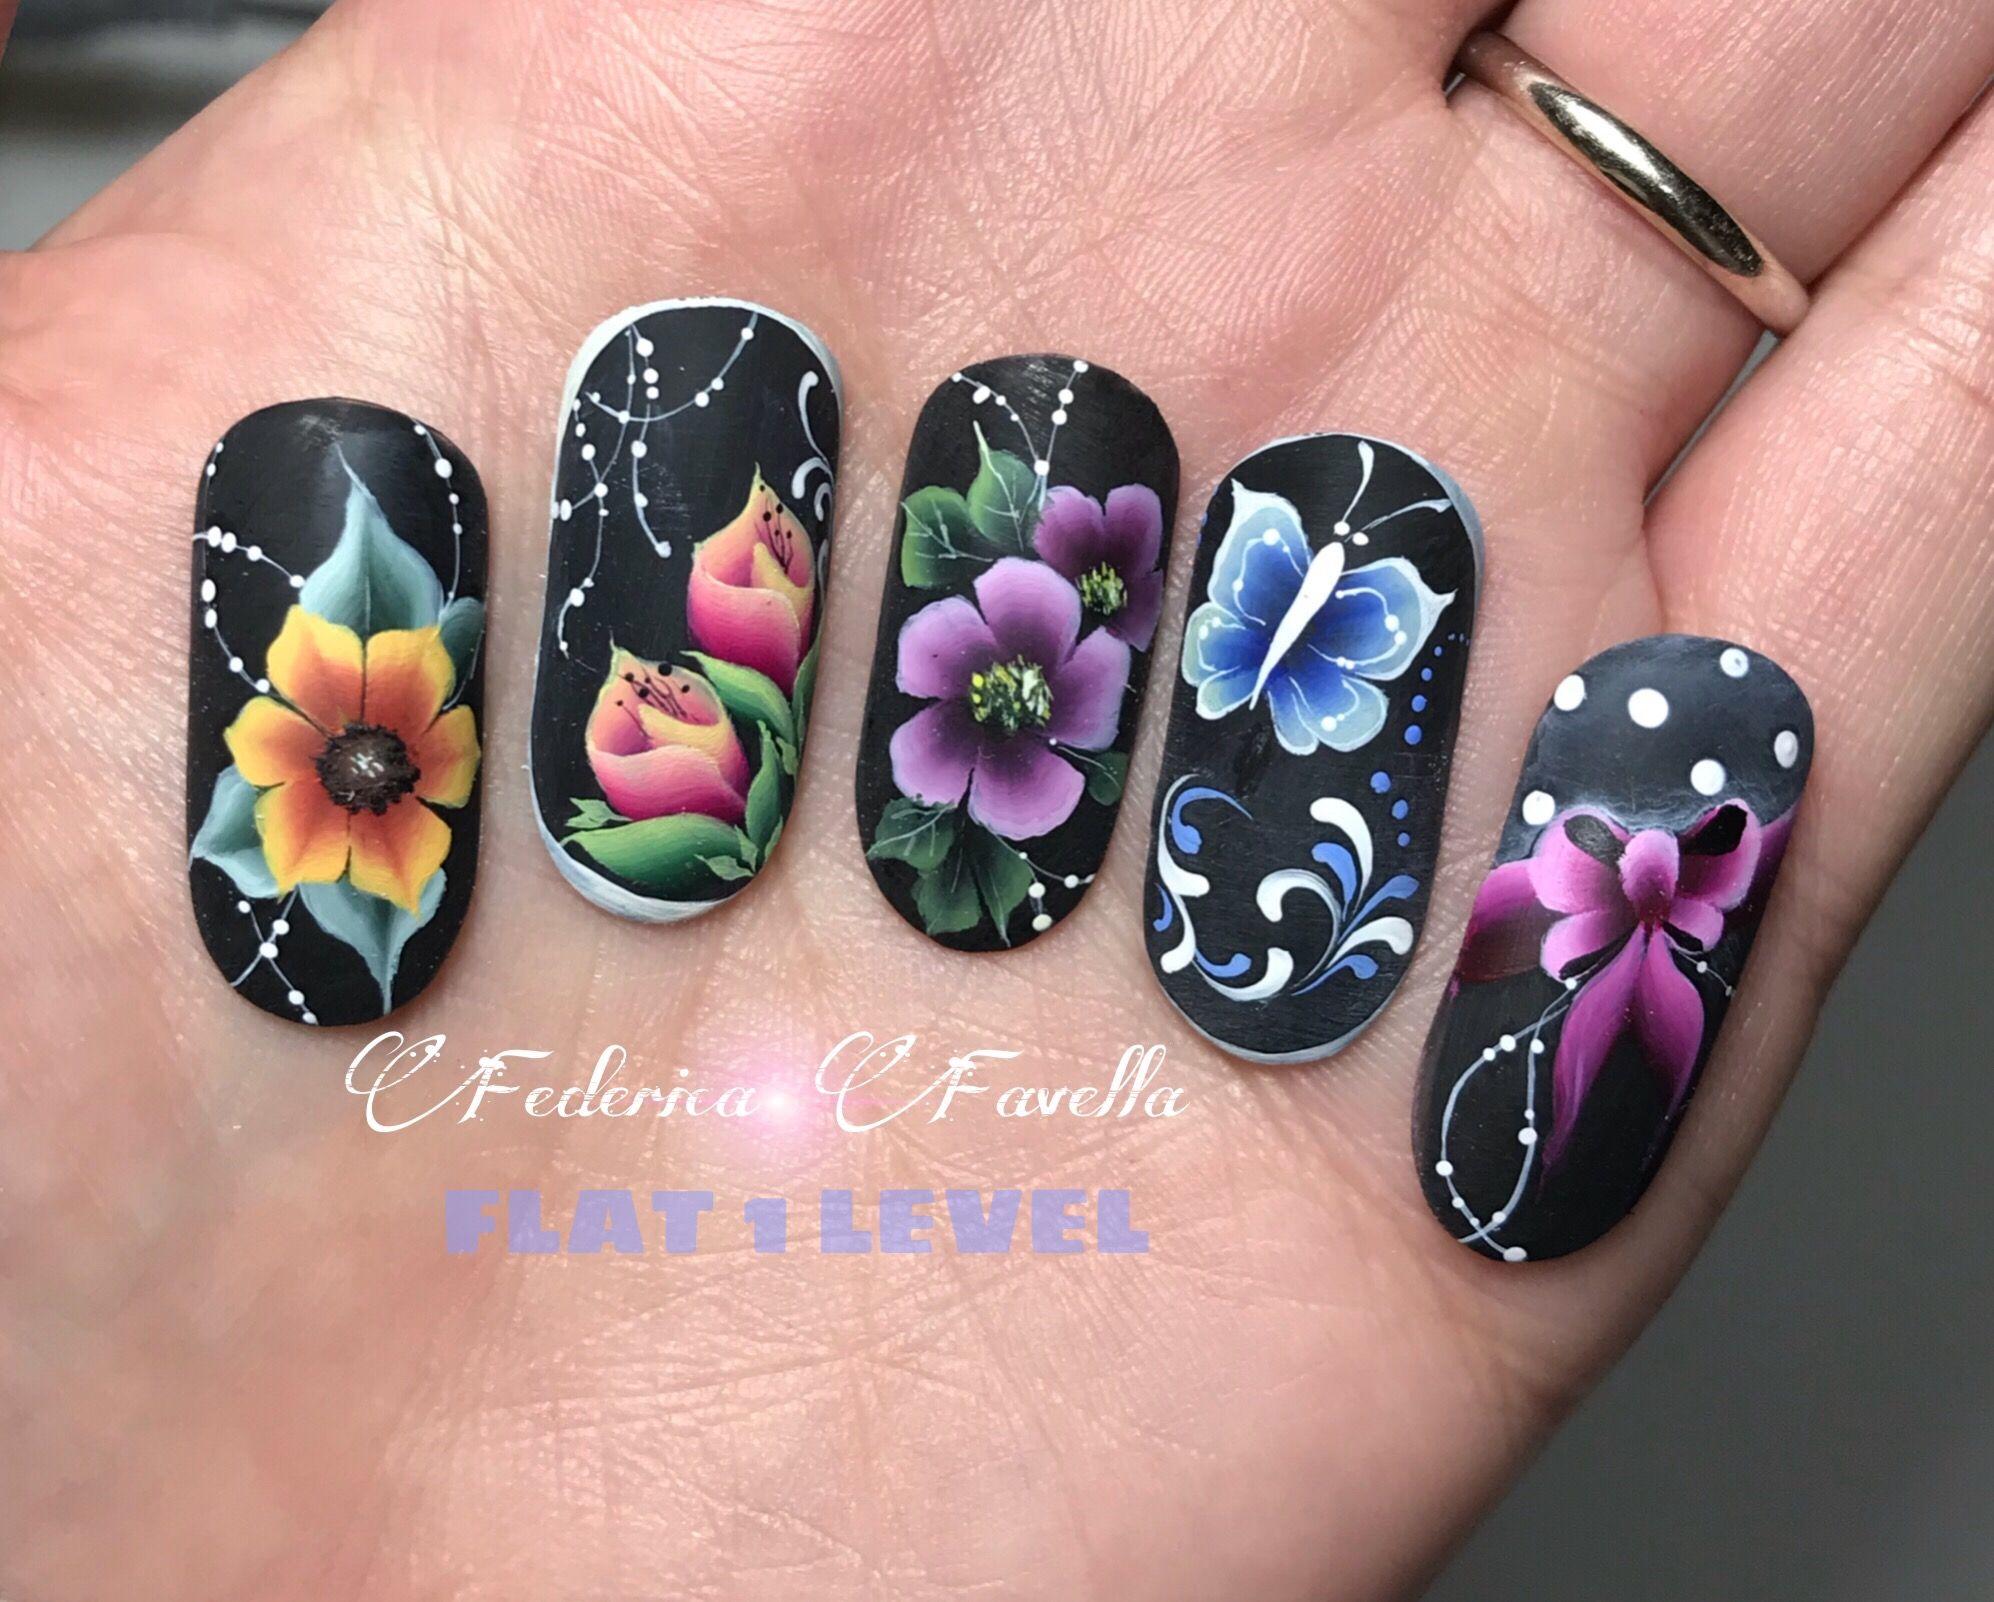 Pin by margarita xociuah on Manicuras | Pinterest | Beautiful nail ...